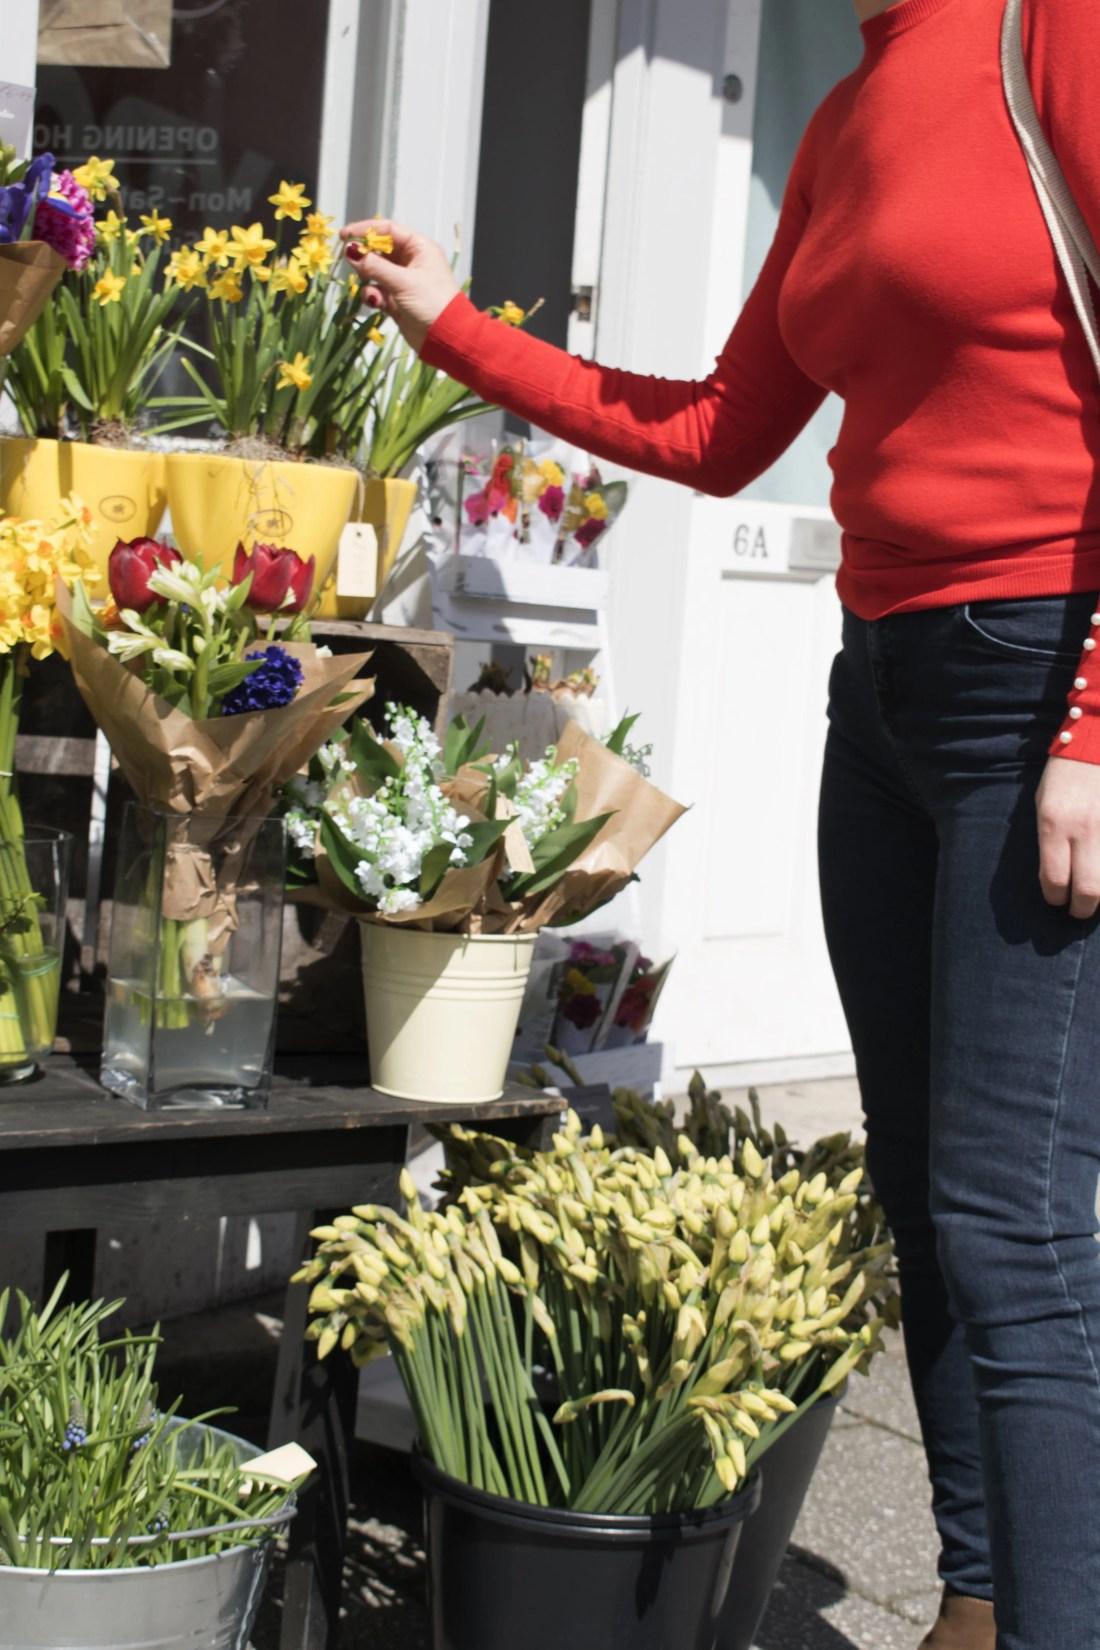 Joy Spring Delight Seasons Seasonal Plants Living Life Intentional Slow Mindful Nature